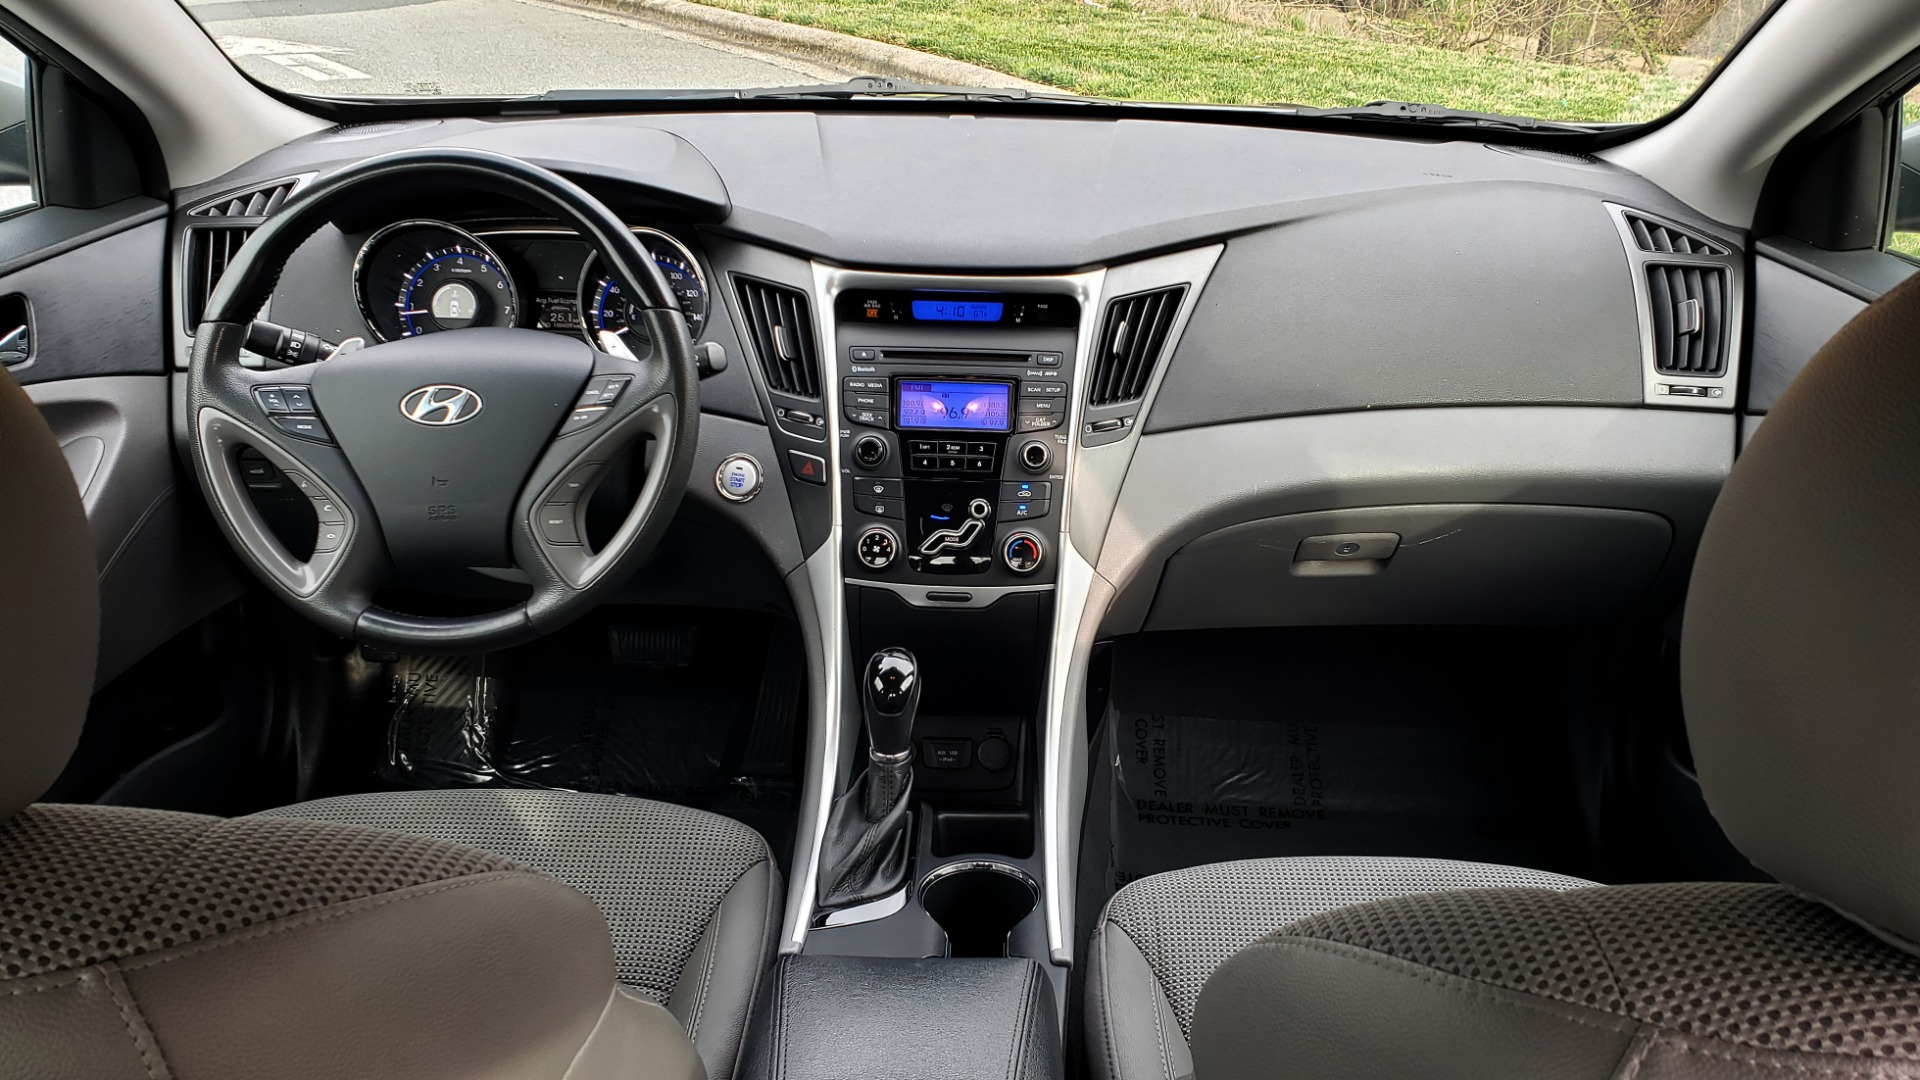 Used 2013 Hyundai SONATA SE AUTO / 2.4L 4-CYL / 6-SPD AUTO / VERY CLEAN for sale Sold at Formula Imports in Charlotte NC 28227 74